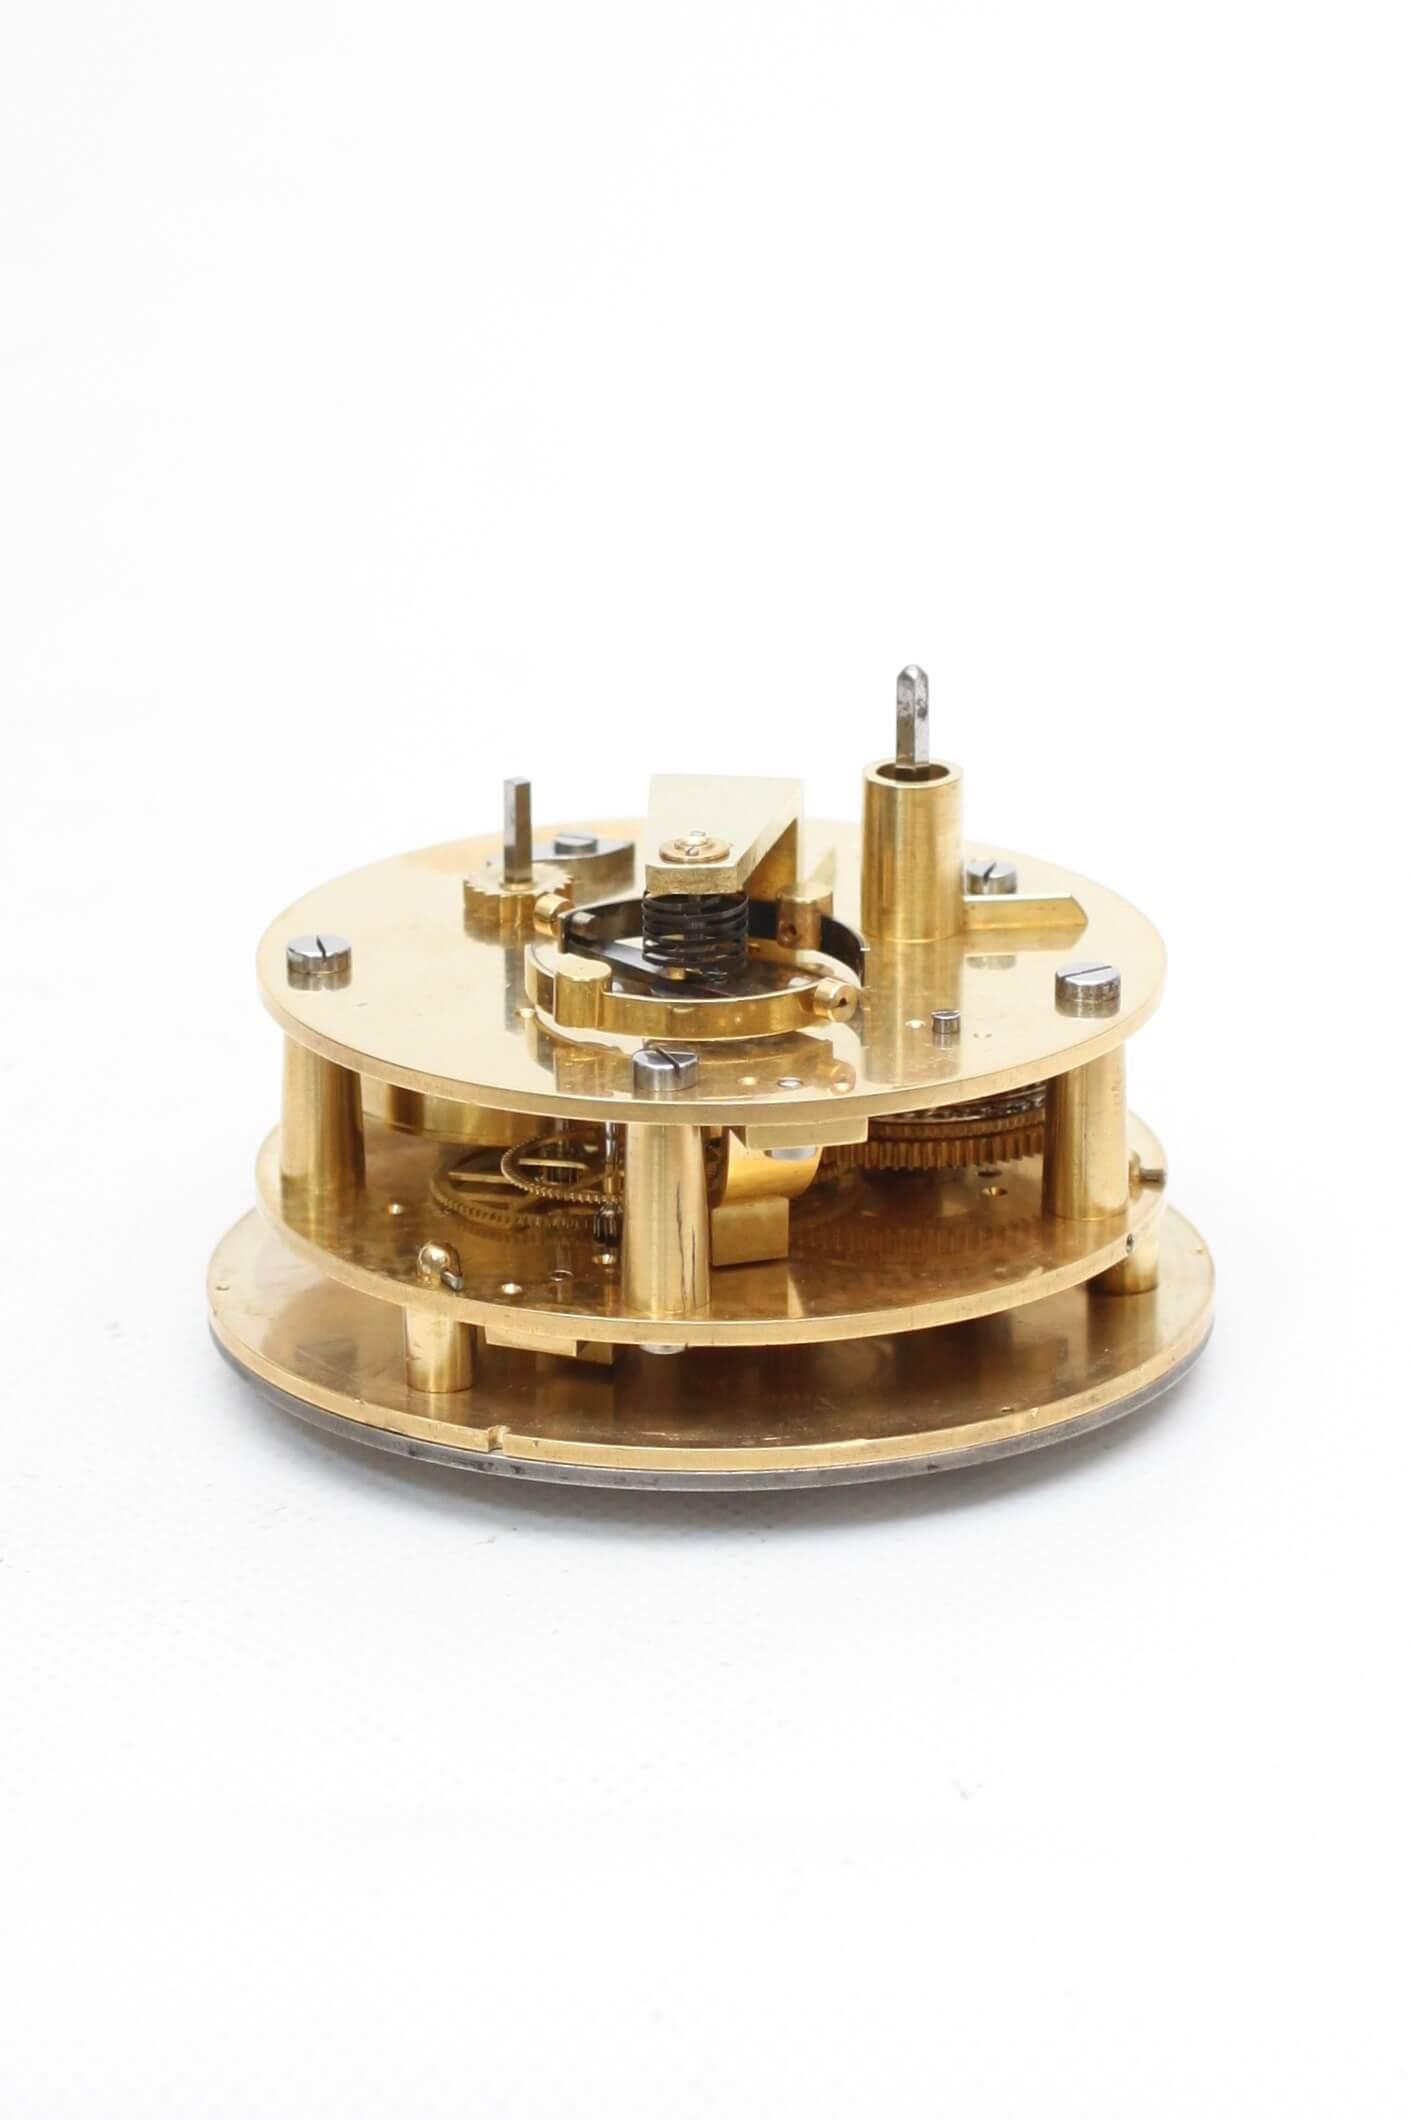 French-antique Clock-mahogany-chronometer-ship-Dumas-1855